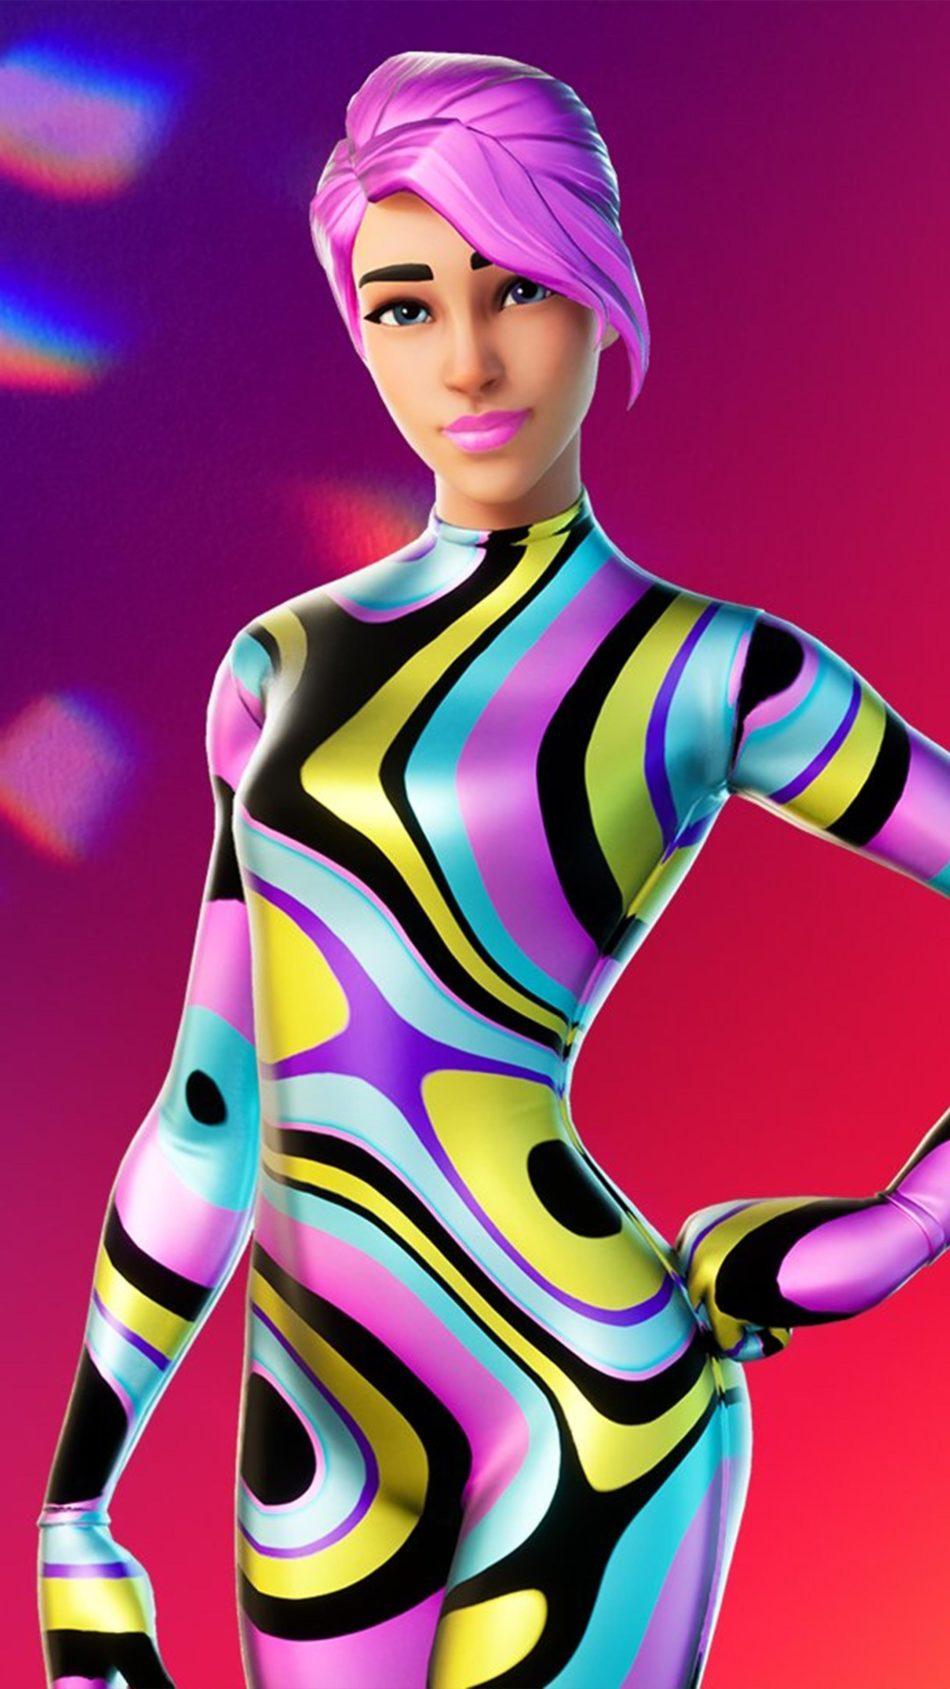 Nightlife Fortnite Skin Free 4K Ultra HD Mobile Wallpaper